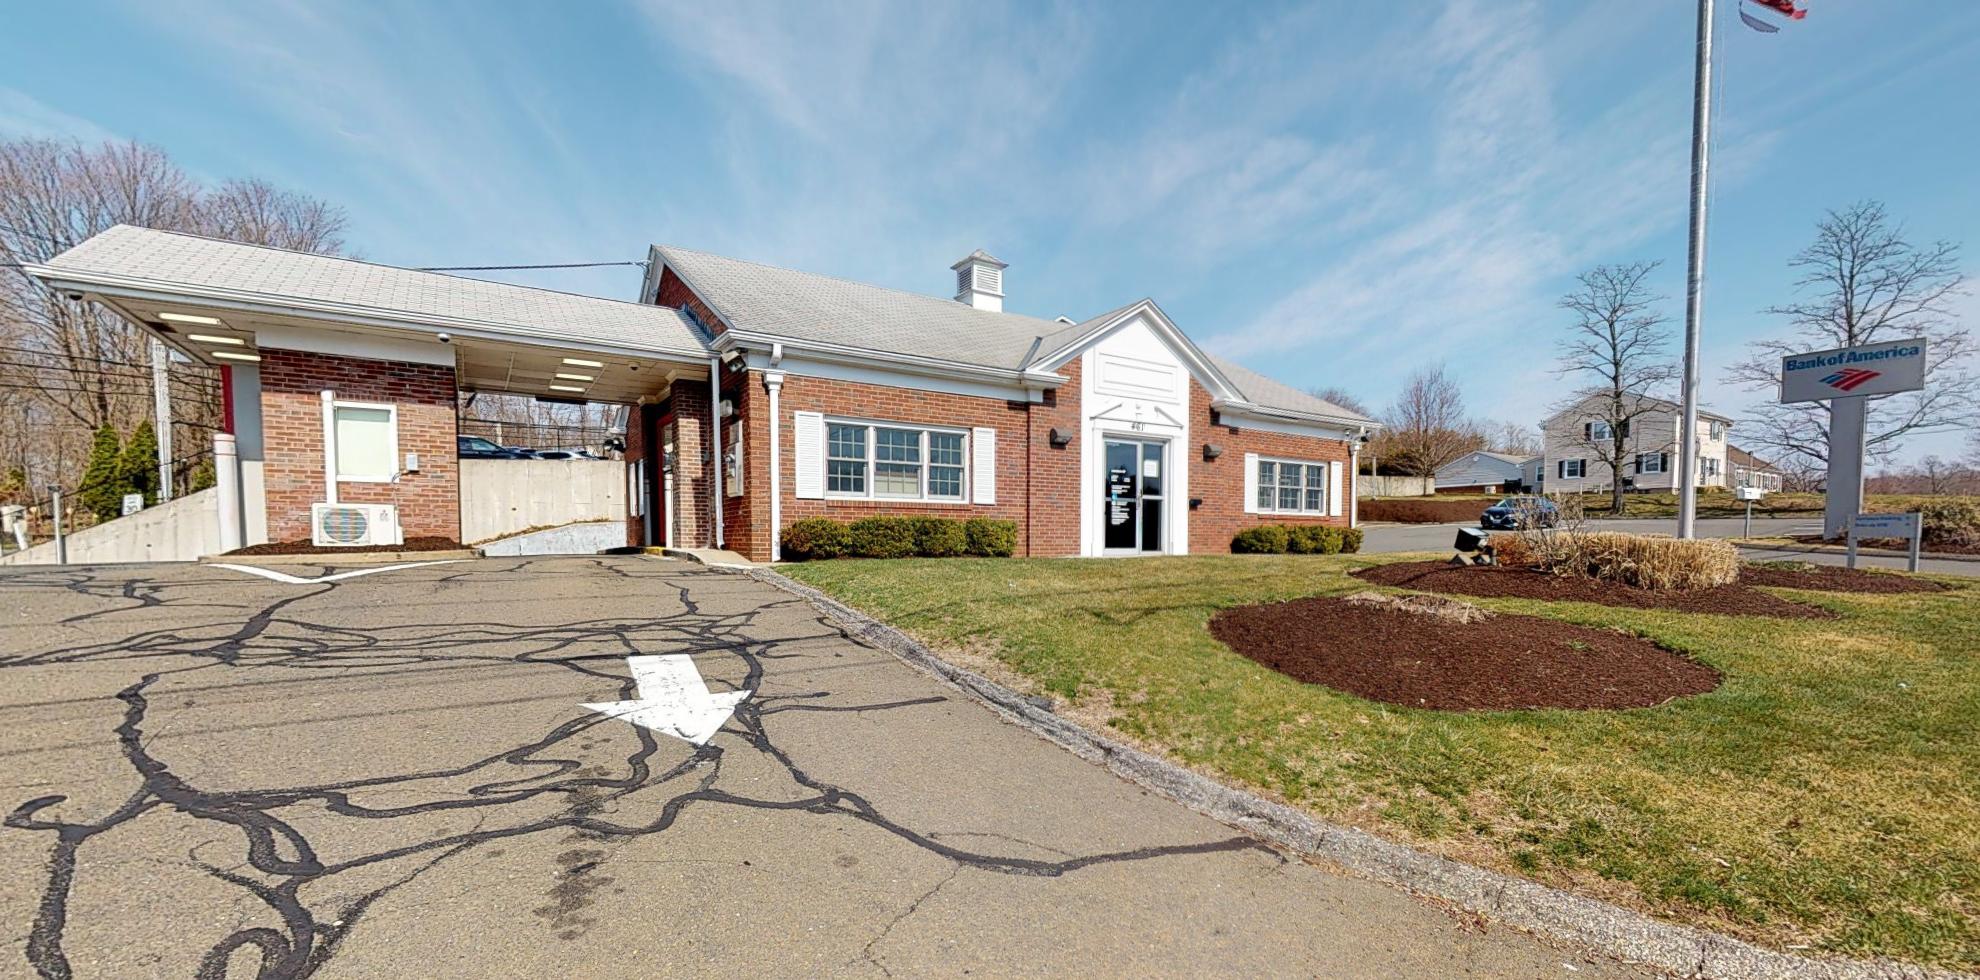 Bank of America financial center with drive-thru ATM   461 Monroe Tpke, Monroe, CT 06468